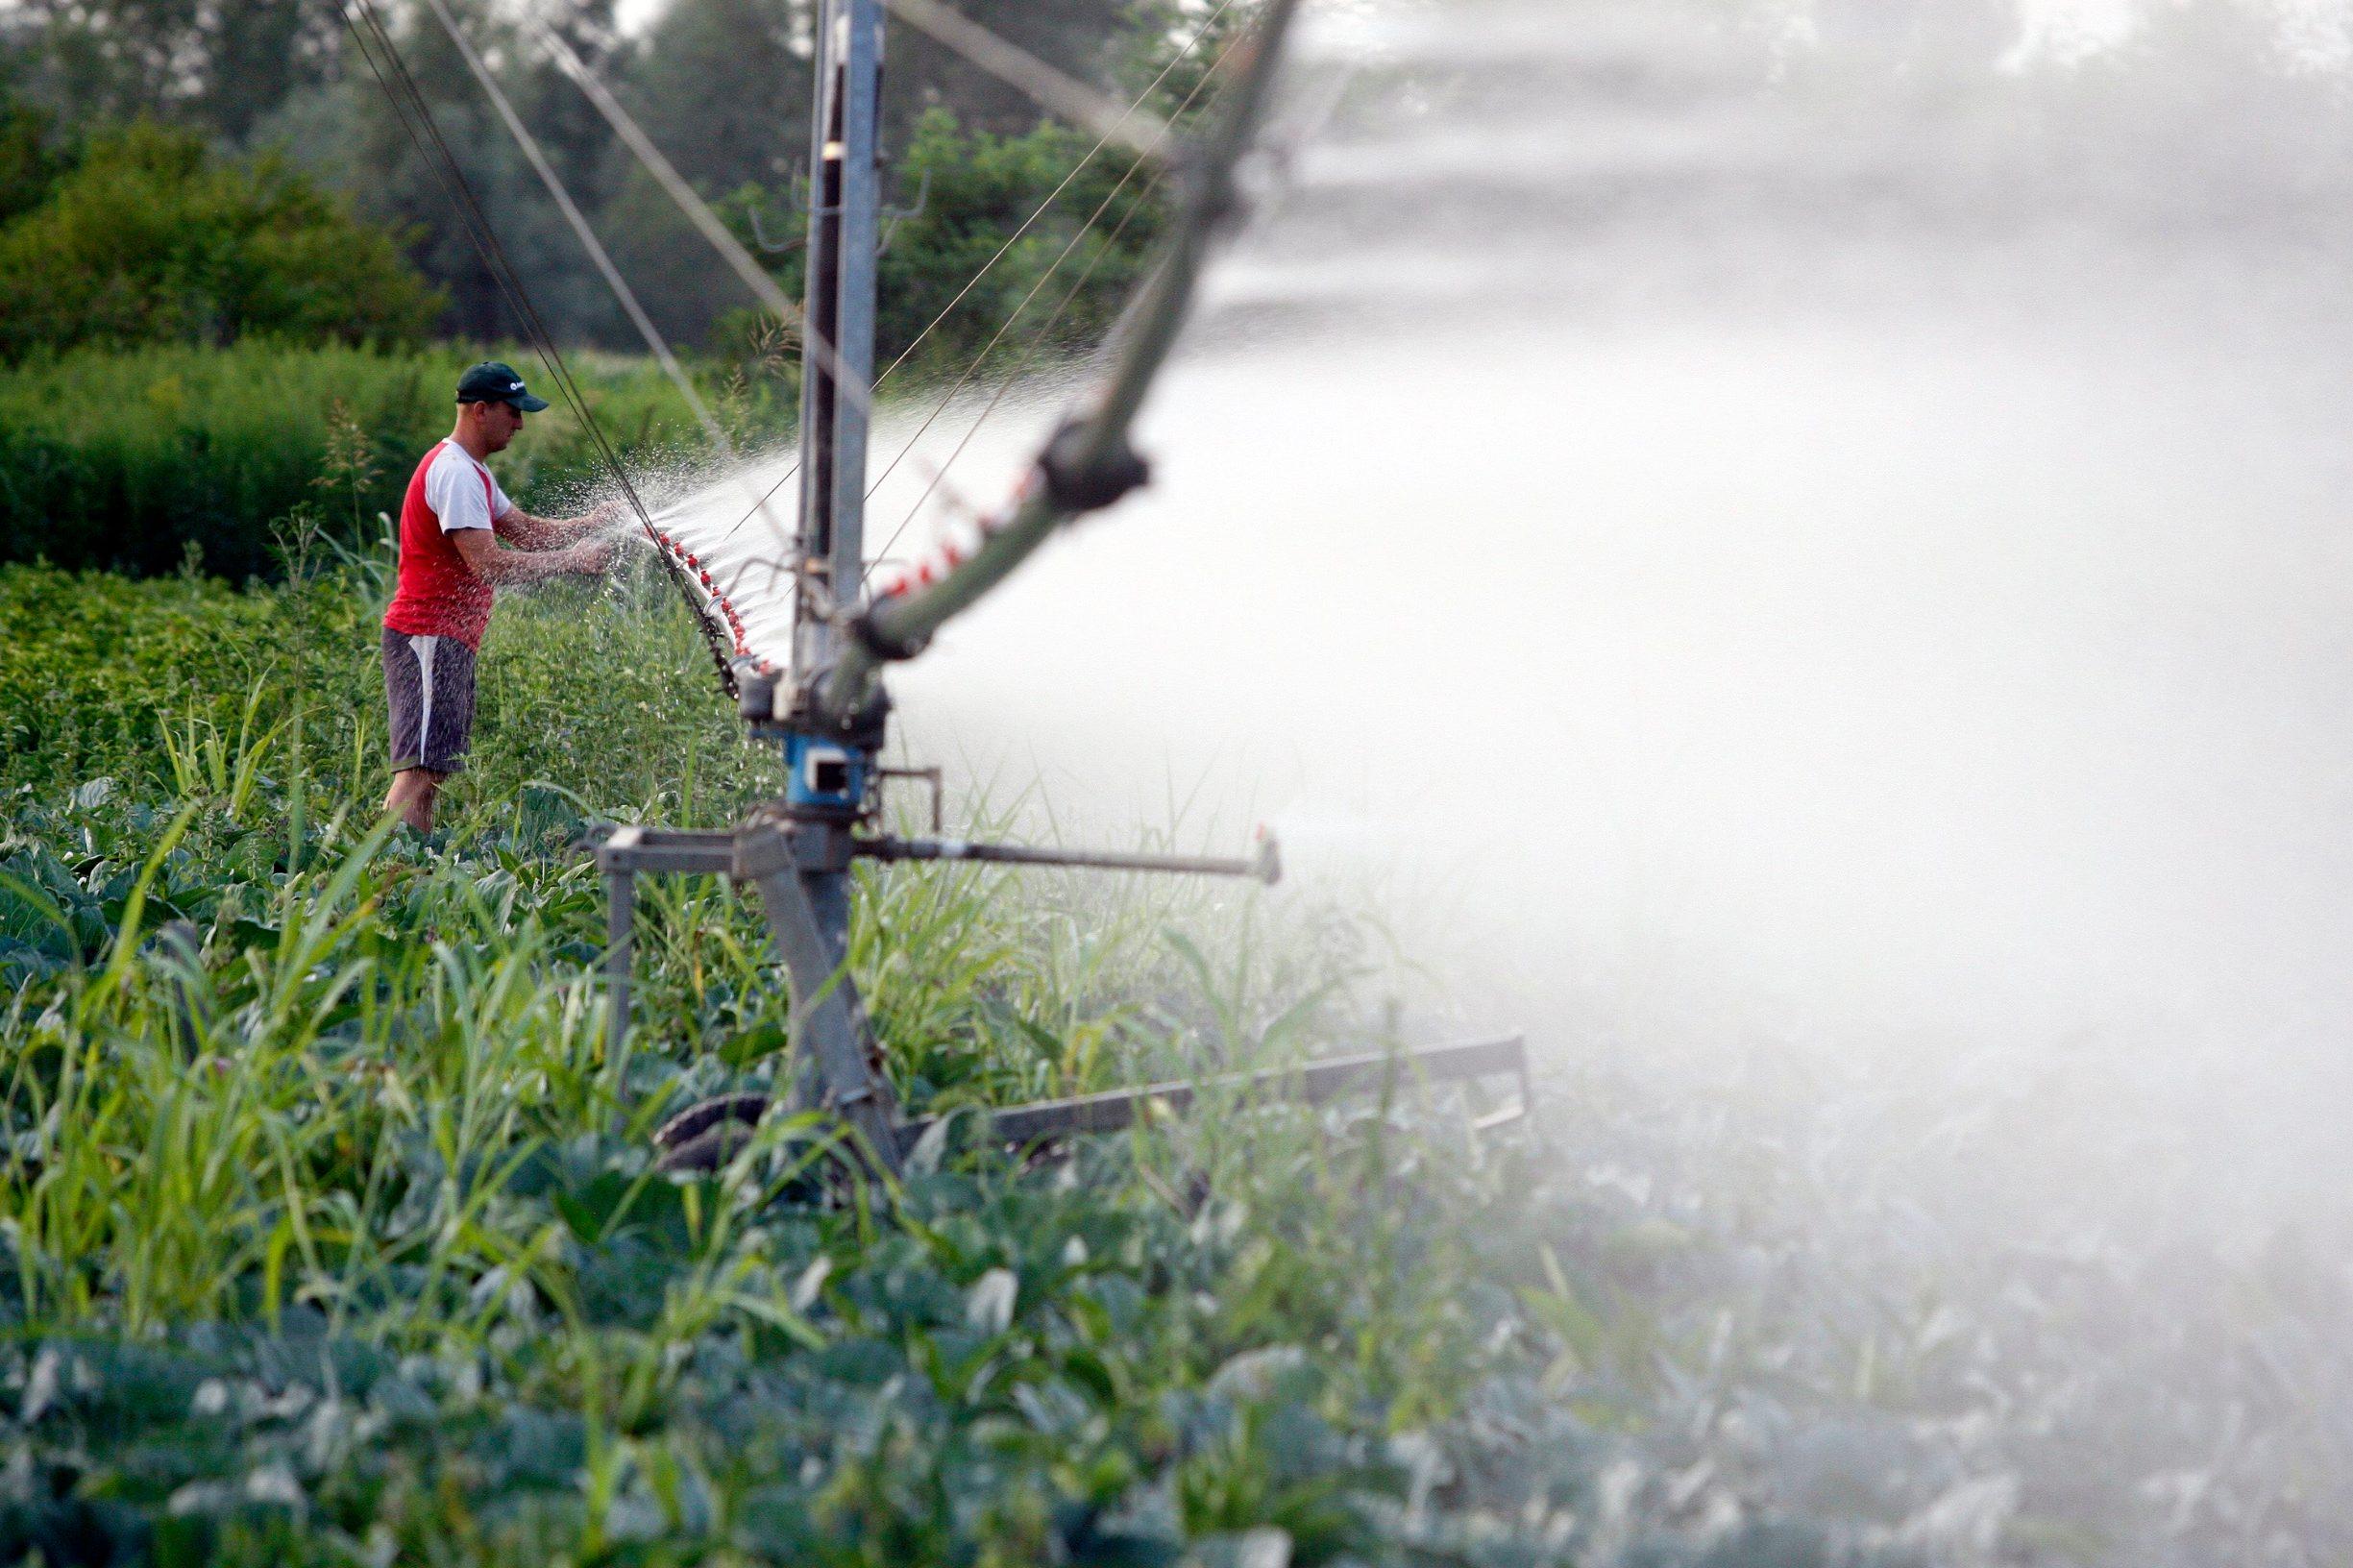 Trenutno se u Hrvatskoj navodnjava oko 20.000 ha ili oko 2% obradivih poljoprivrednih površina